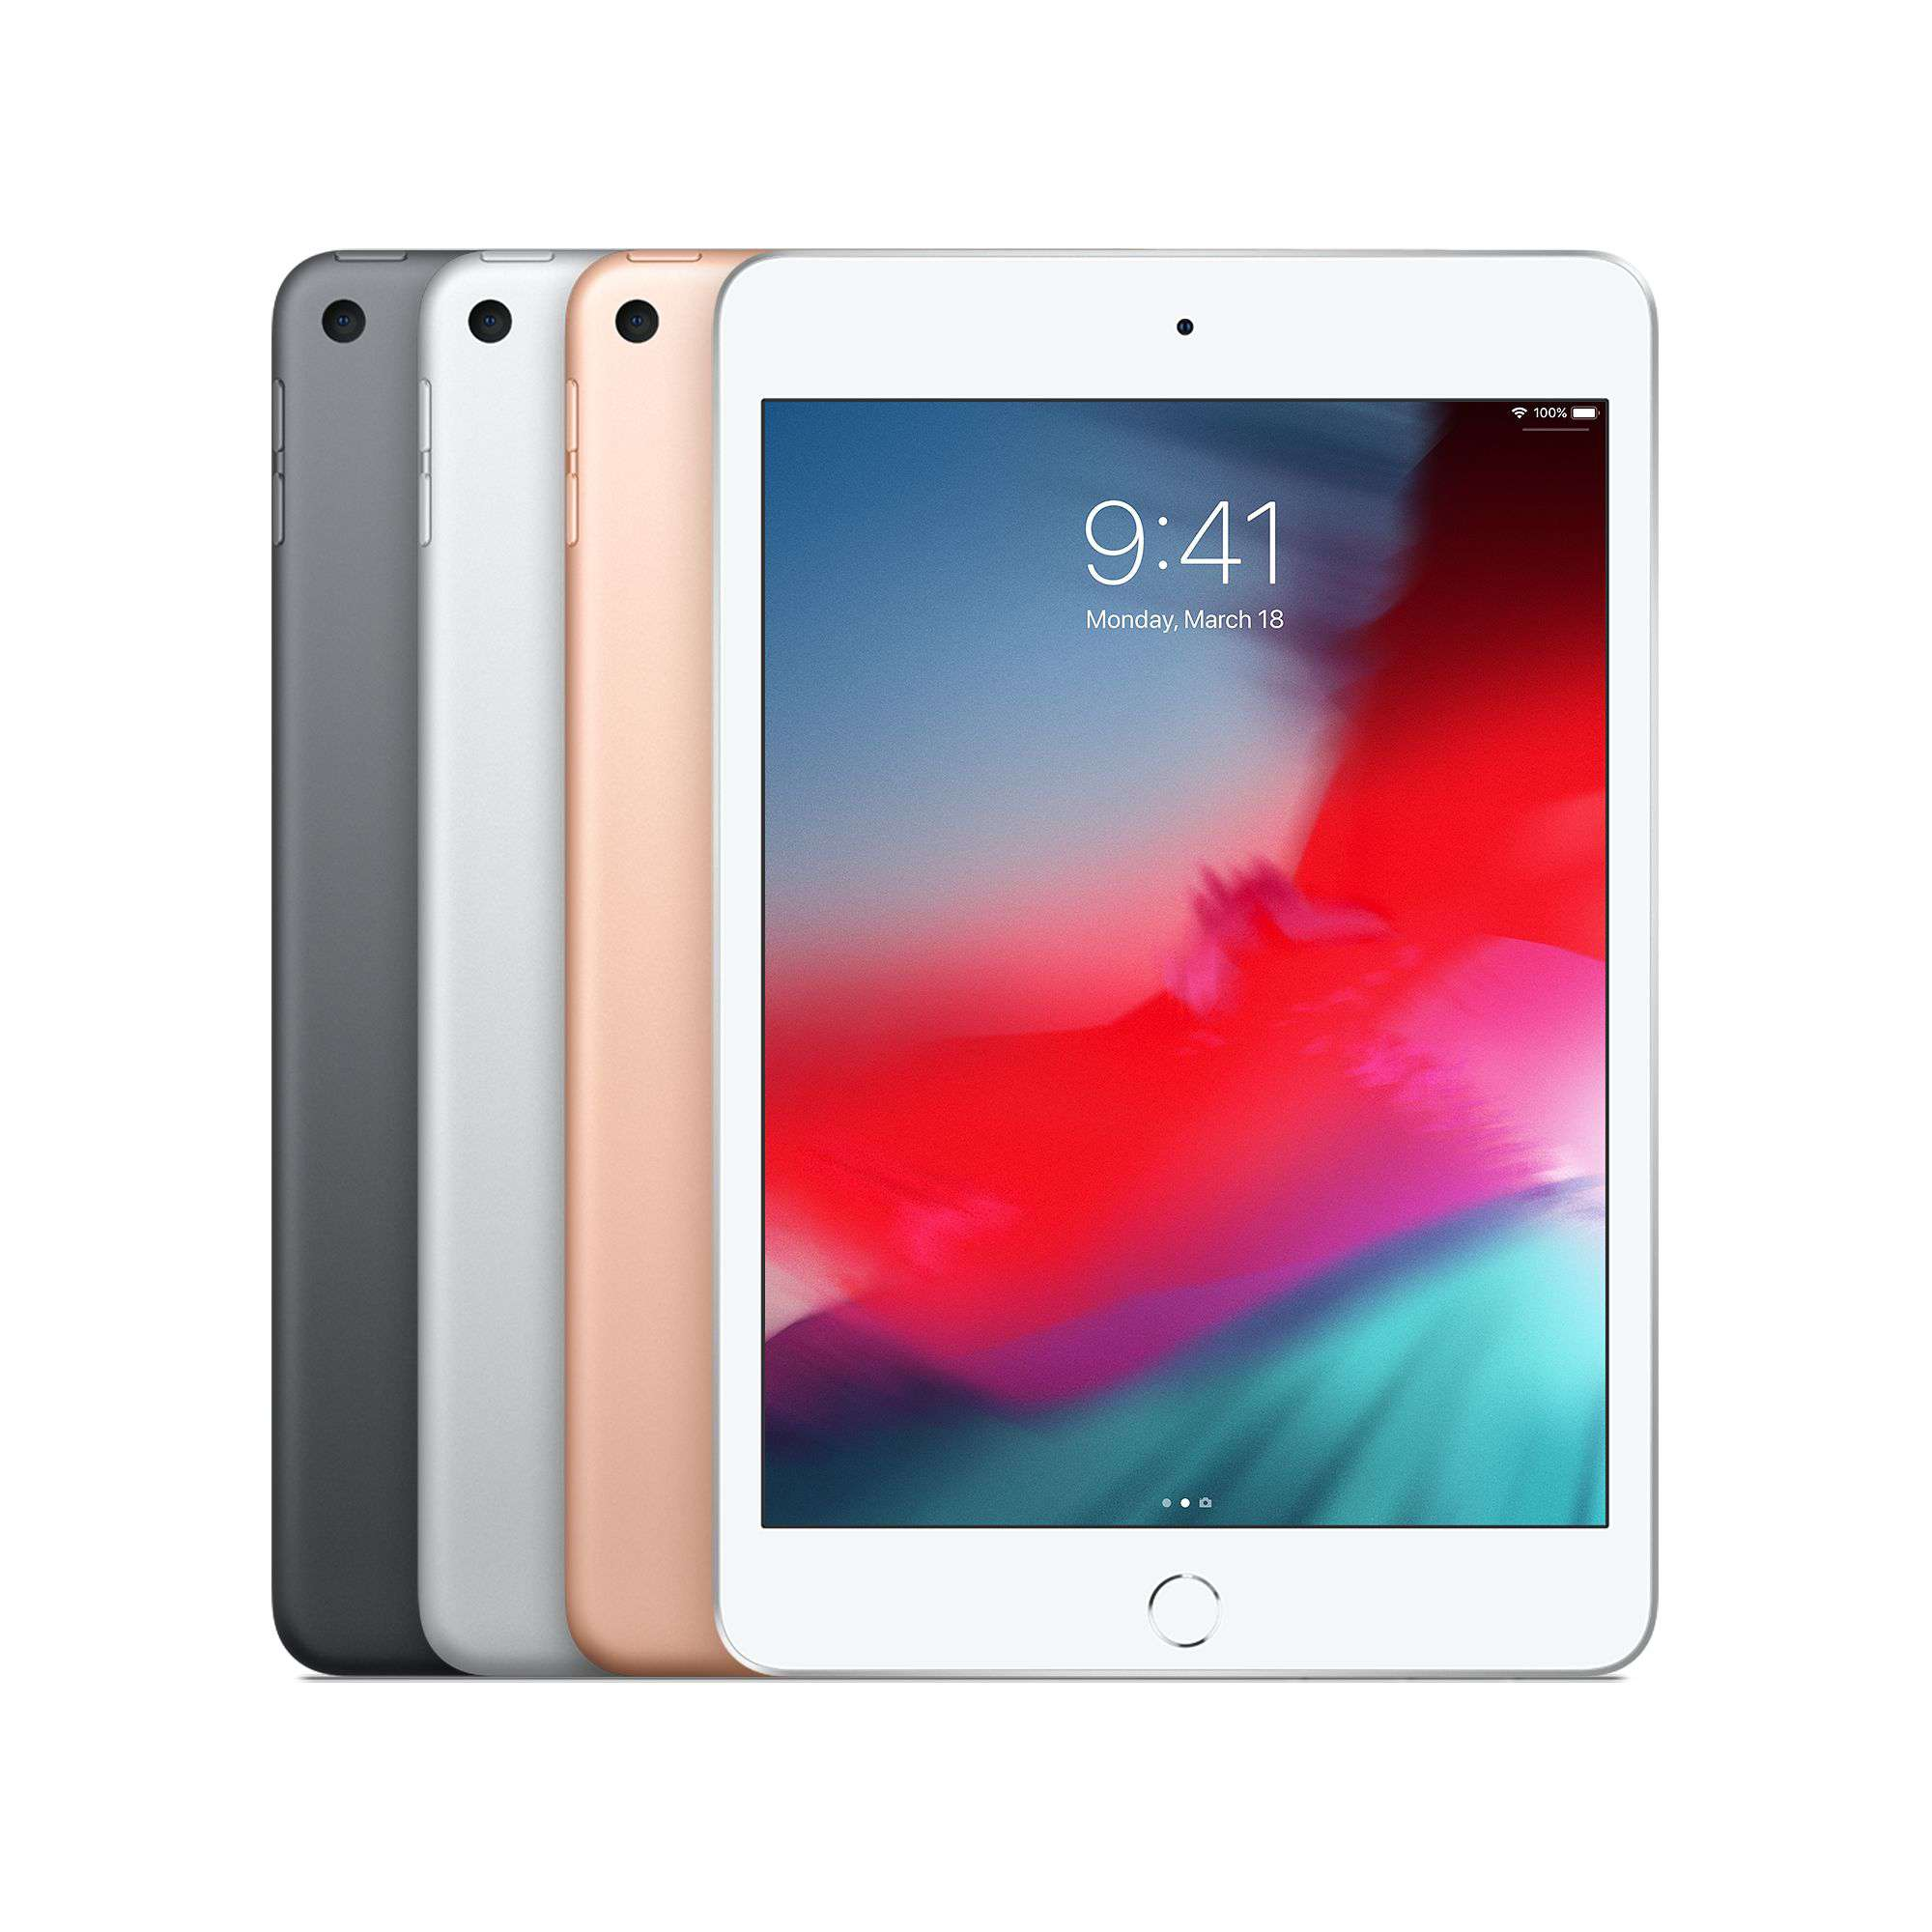 Product screenshot of the iPad Mini 5 in various colors